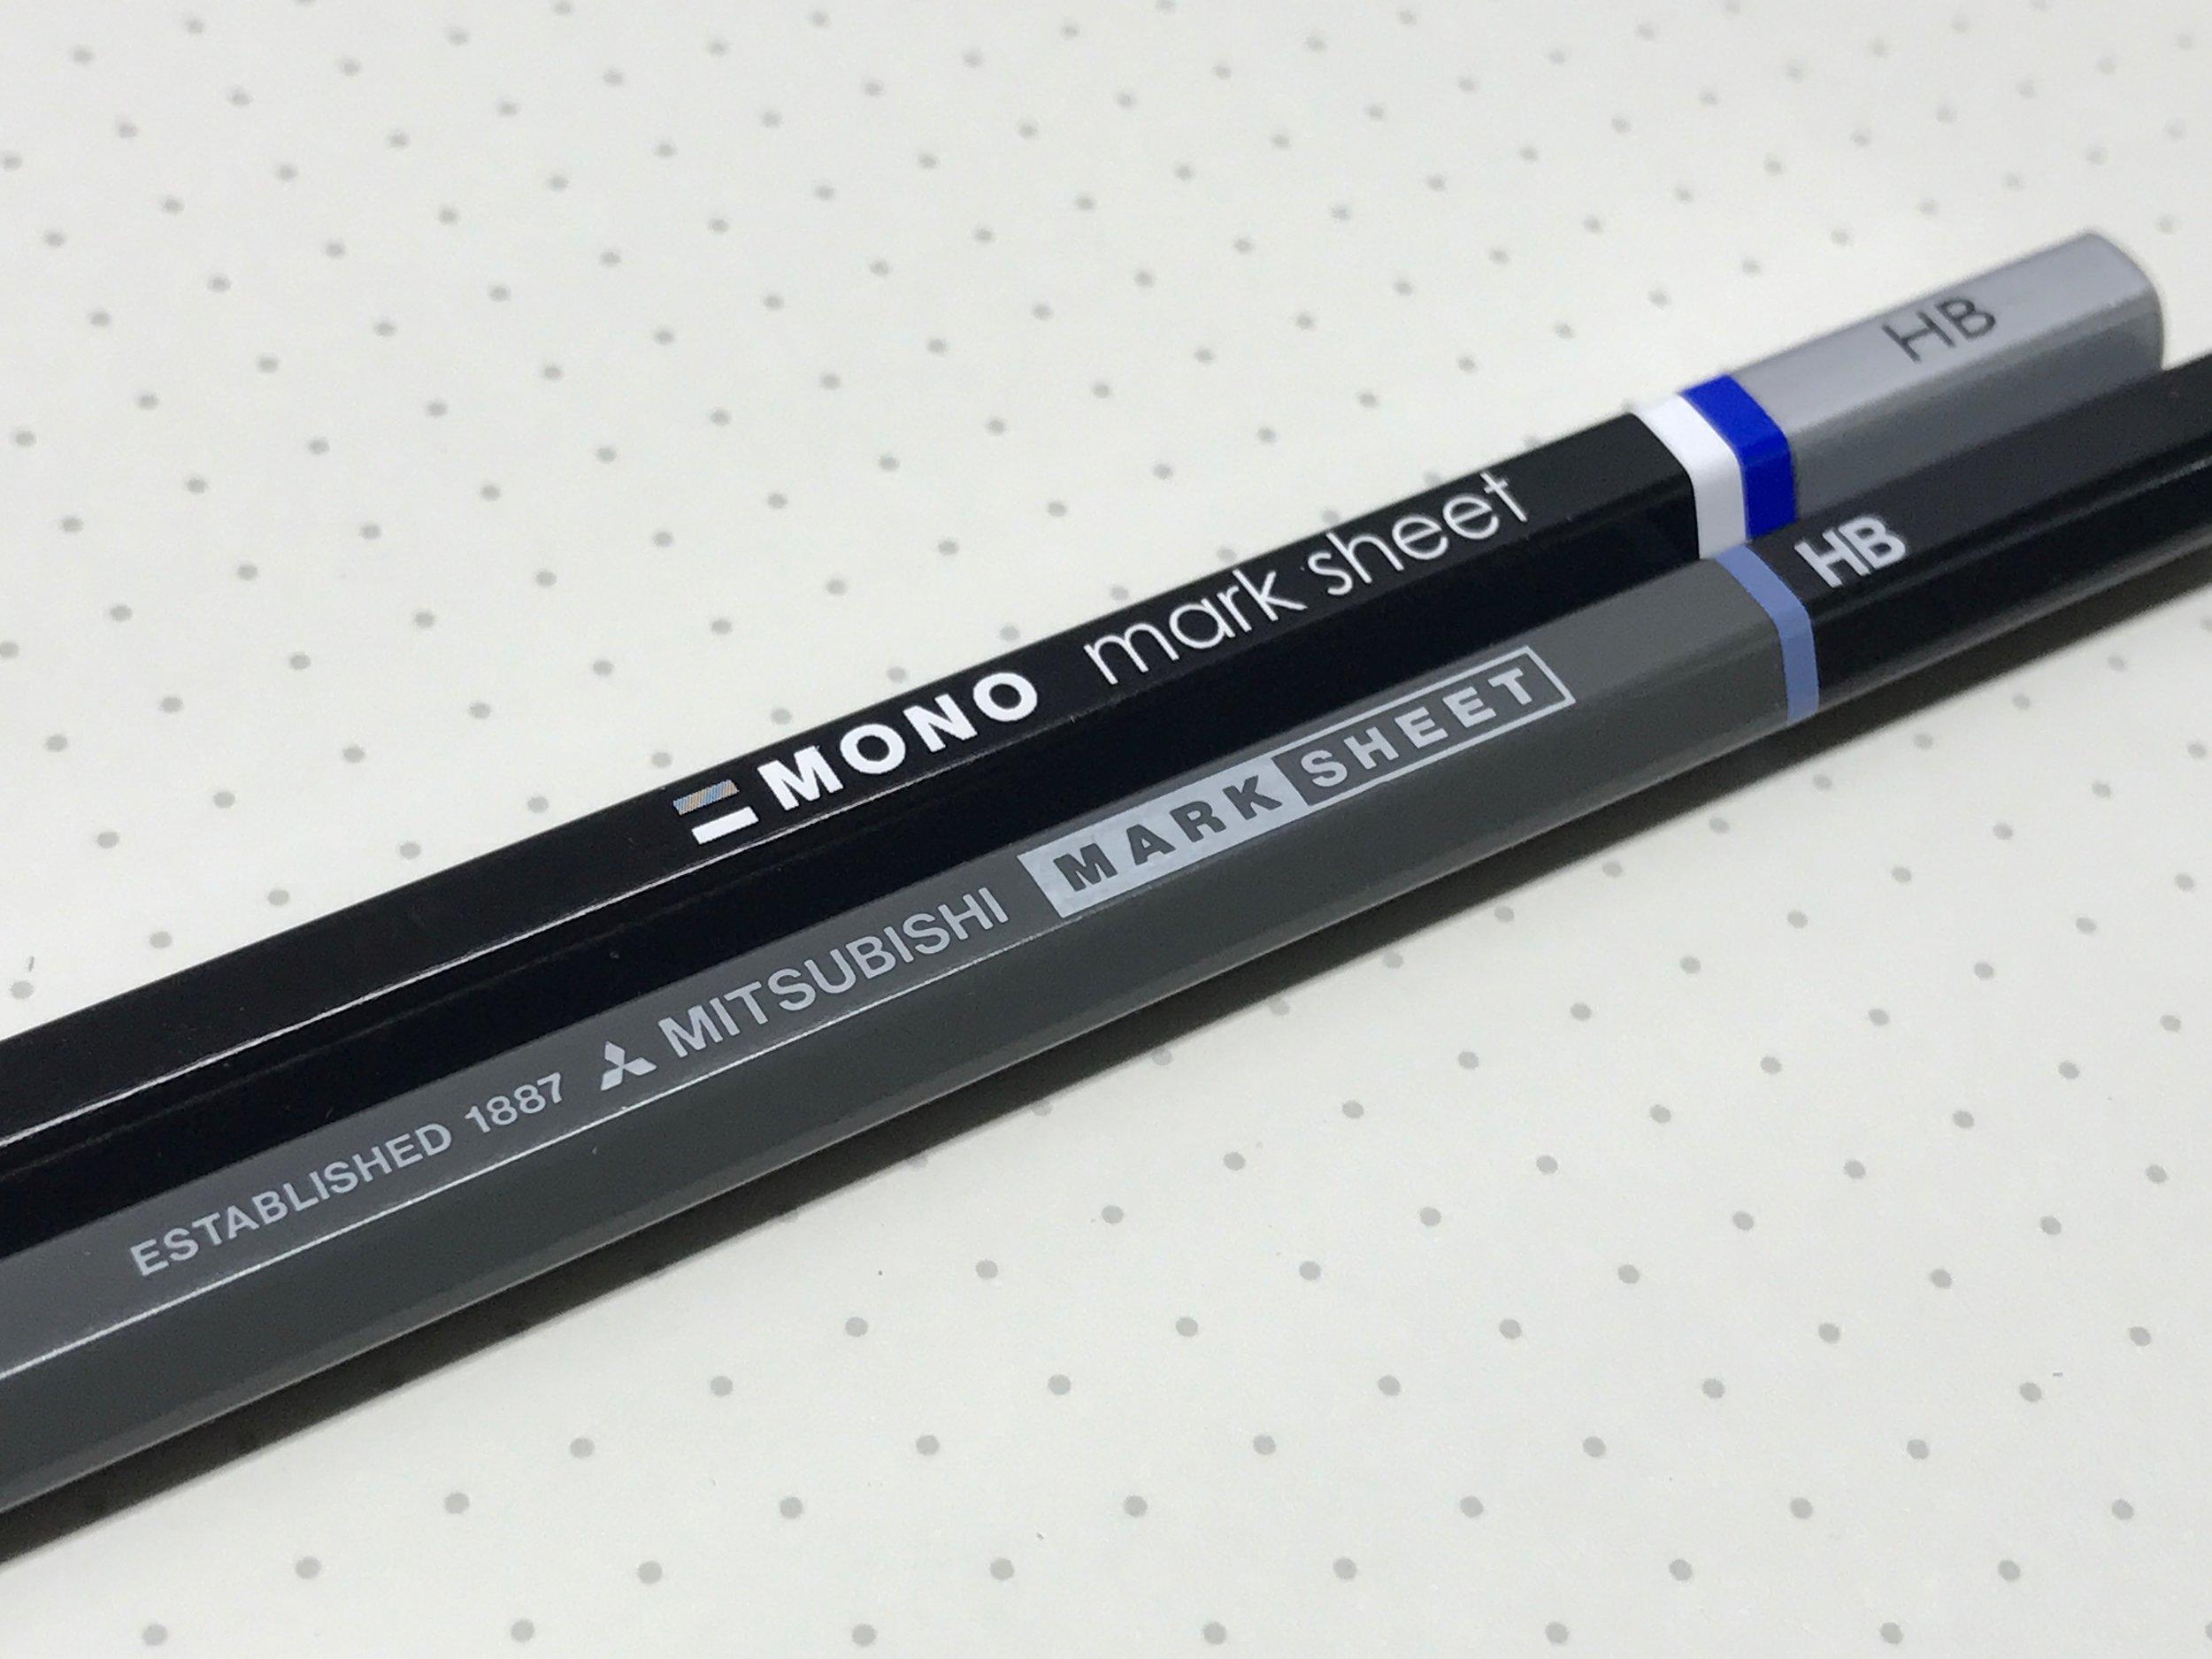 Tombow-Mitsubishi-Mark-Sheet-14.jpg